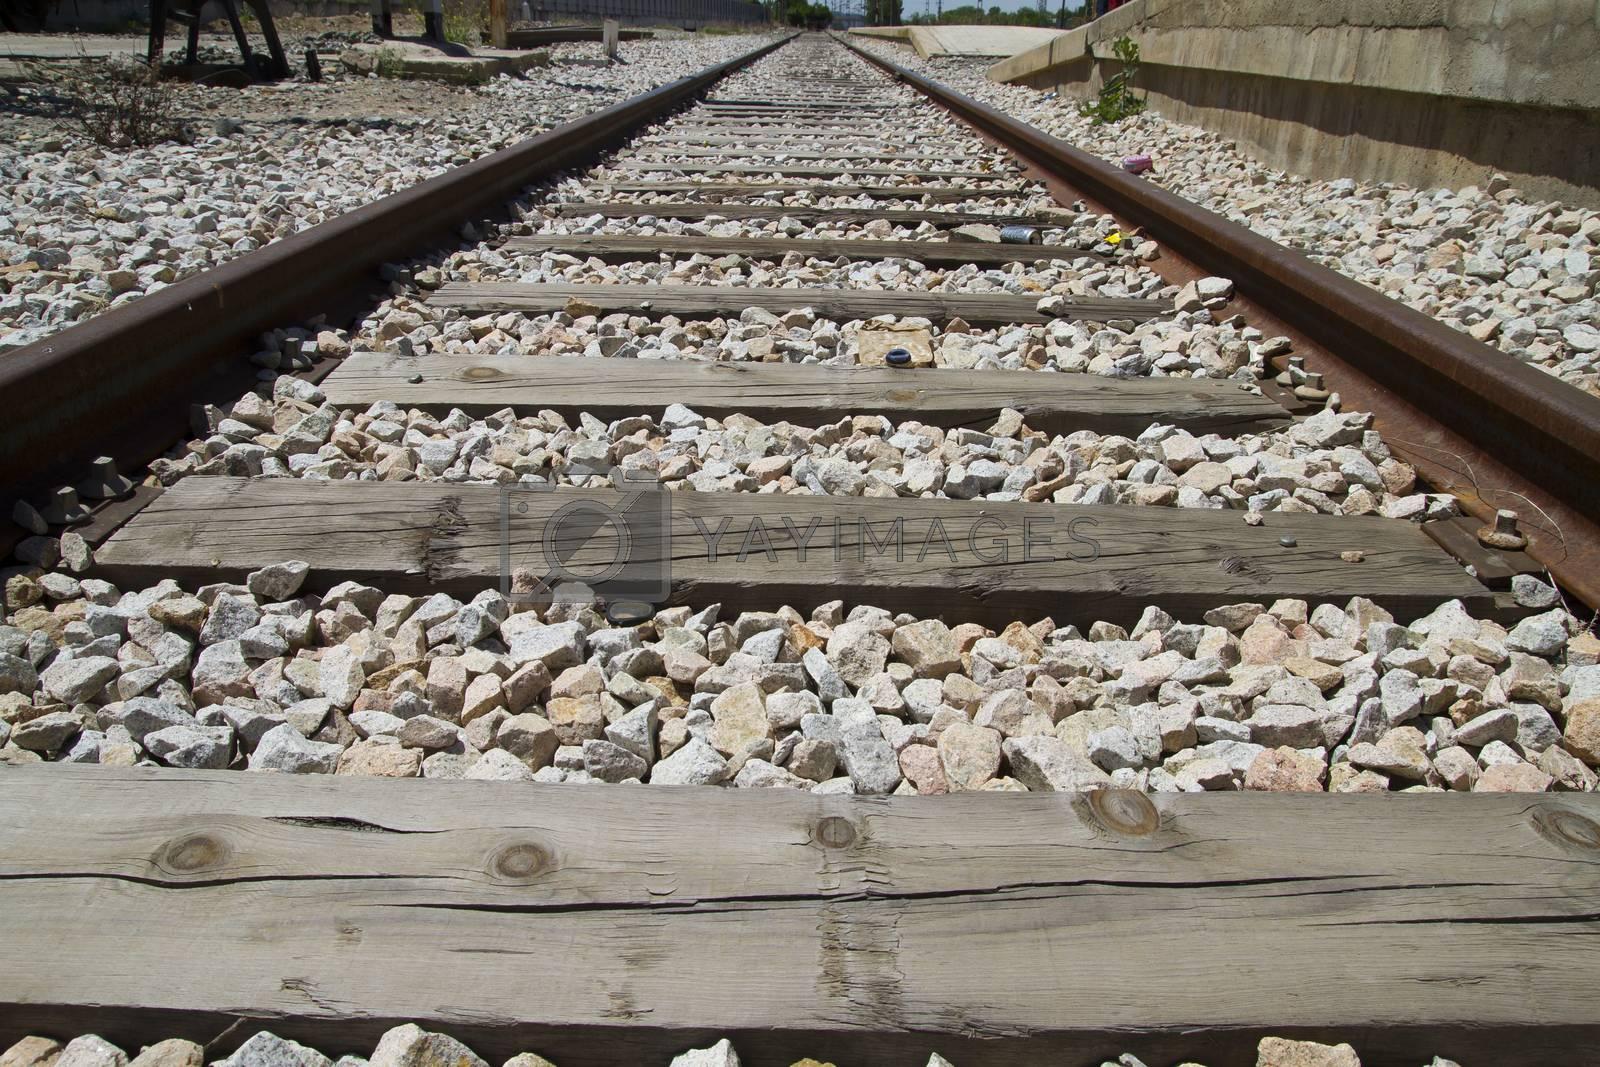 Royalty free image of train rails, detail of railways in Spain by FernandoCortes